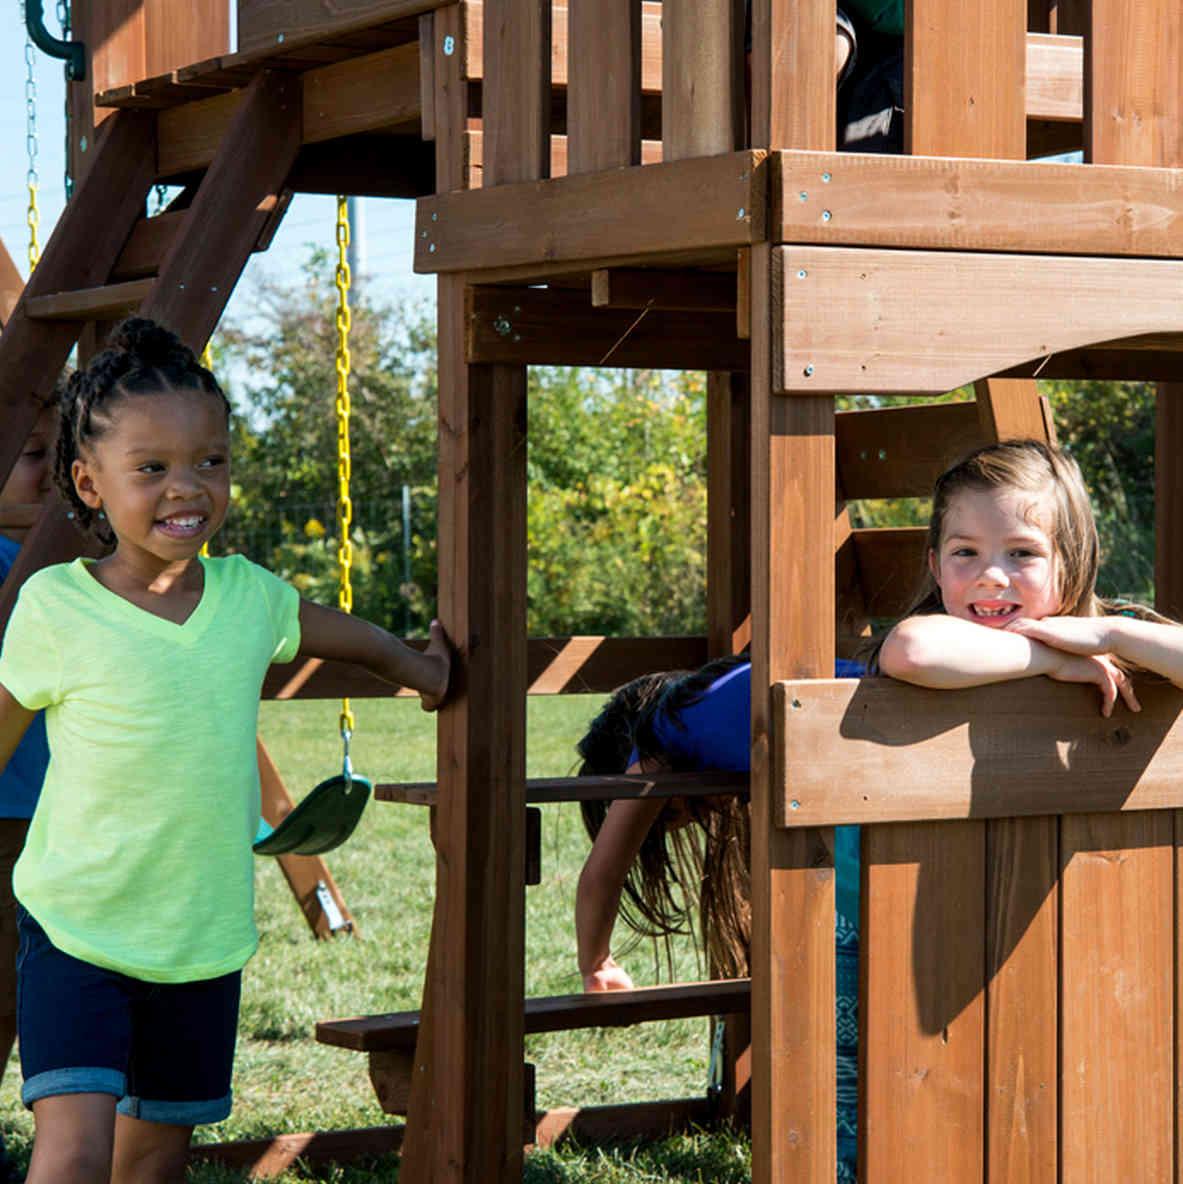 Elkhorn Complete Swing Set (WS-8357) Under deck play area